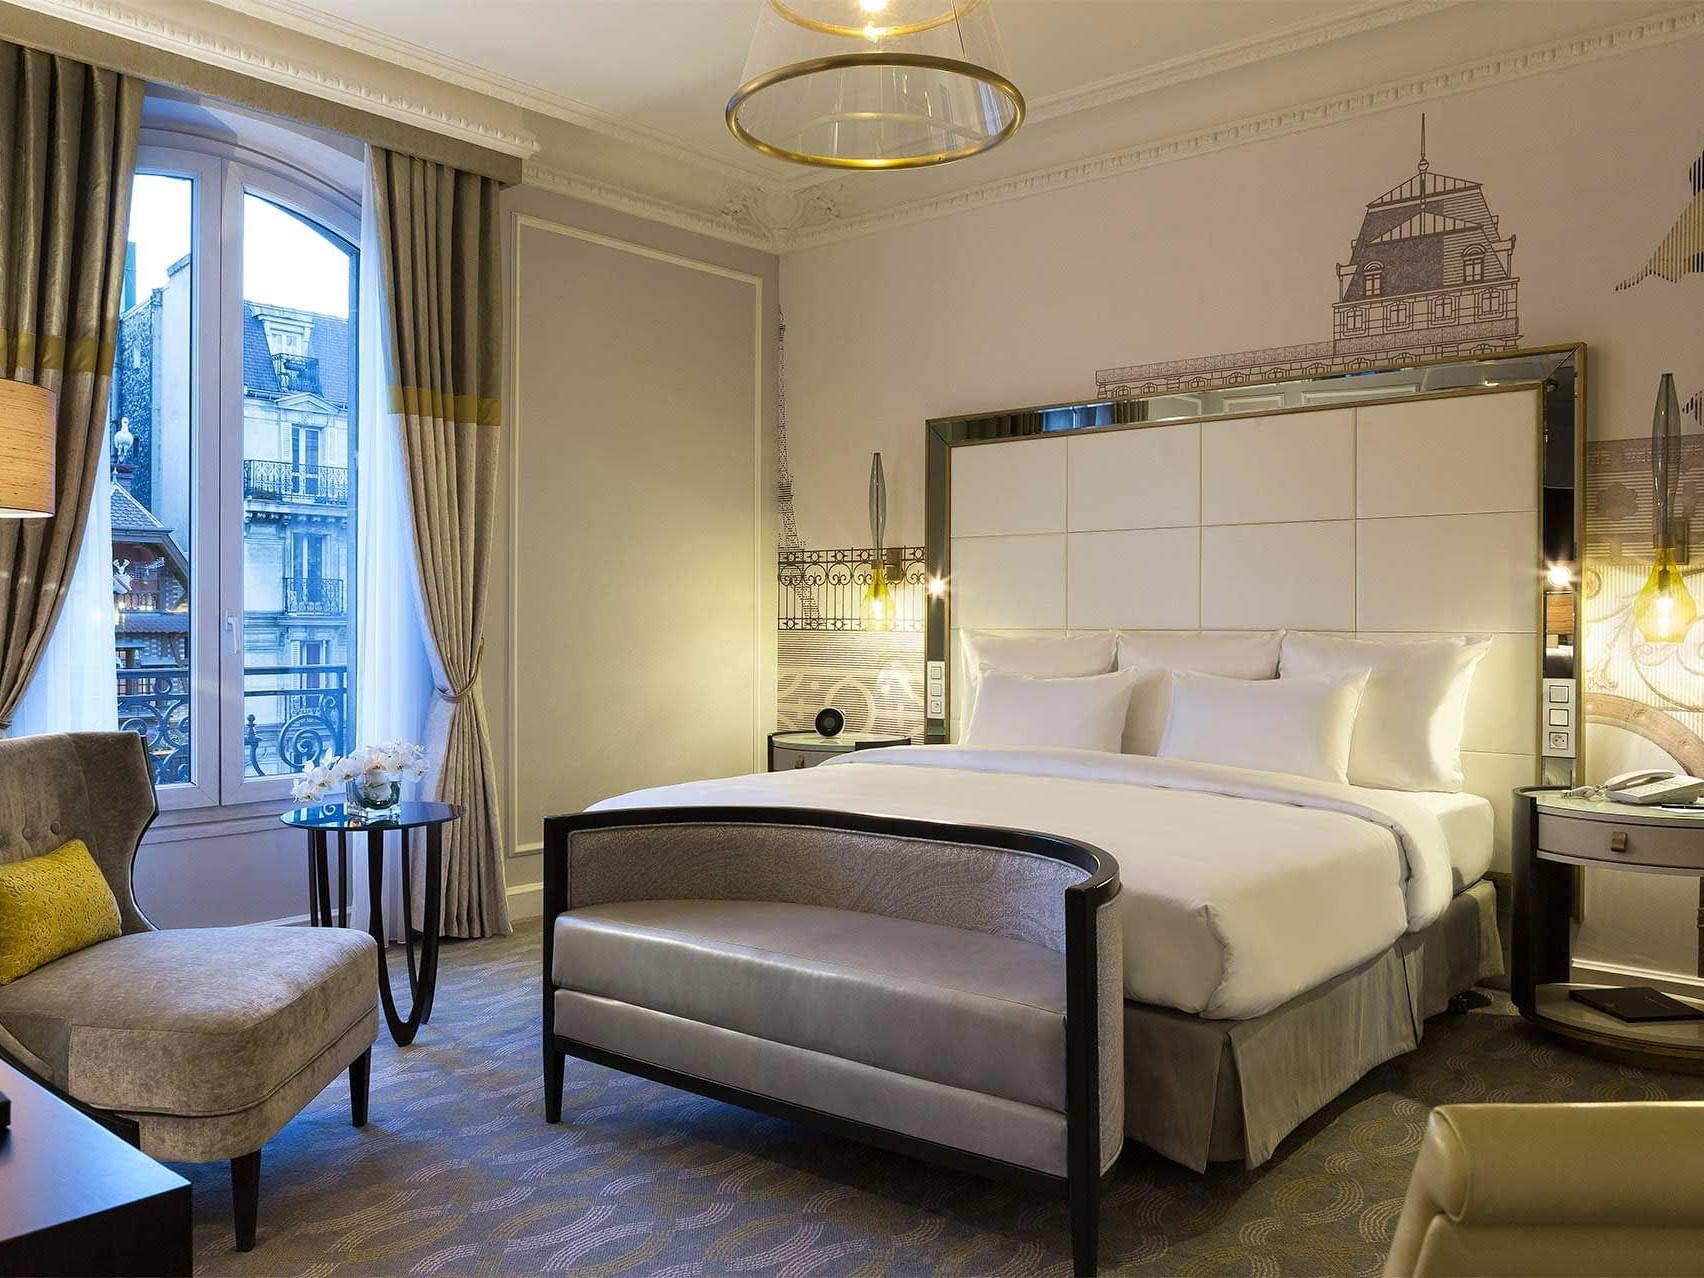 Bed & furniture in Executive Room at Hilton Paris Opera Hotel